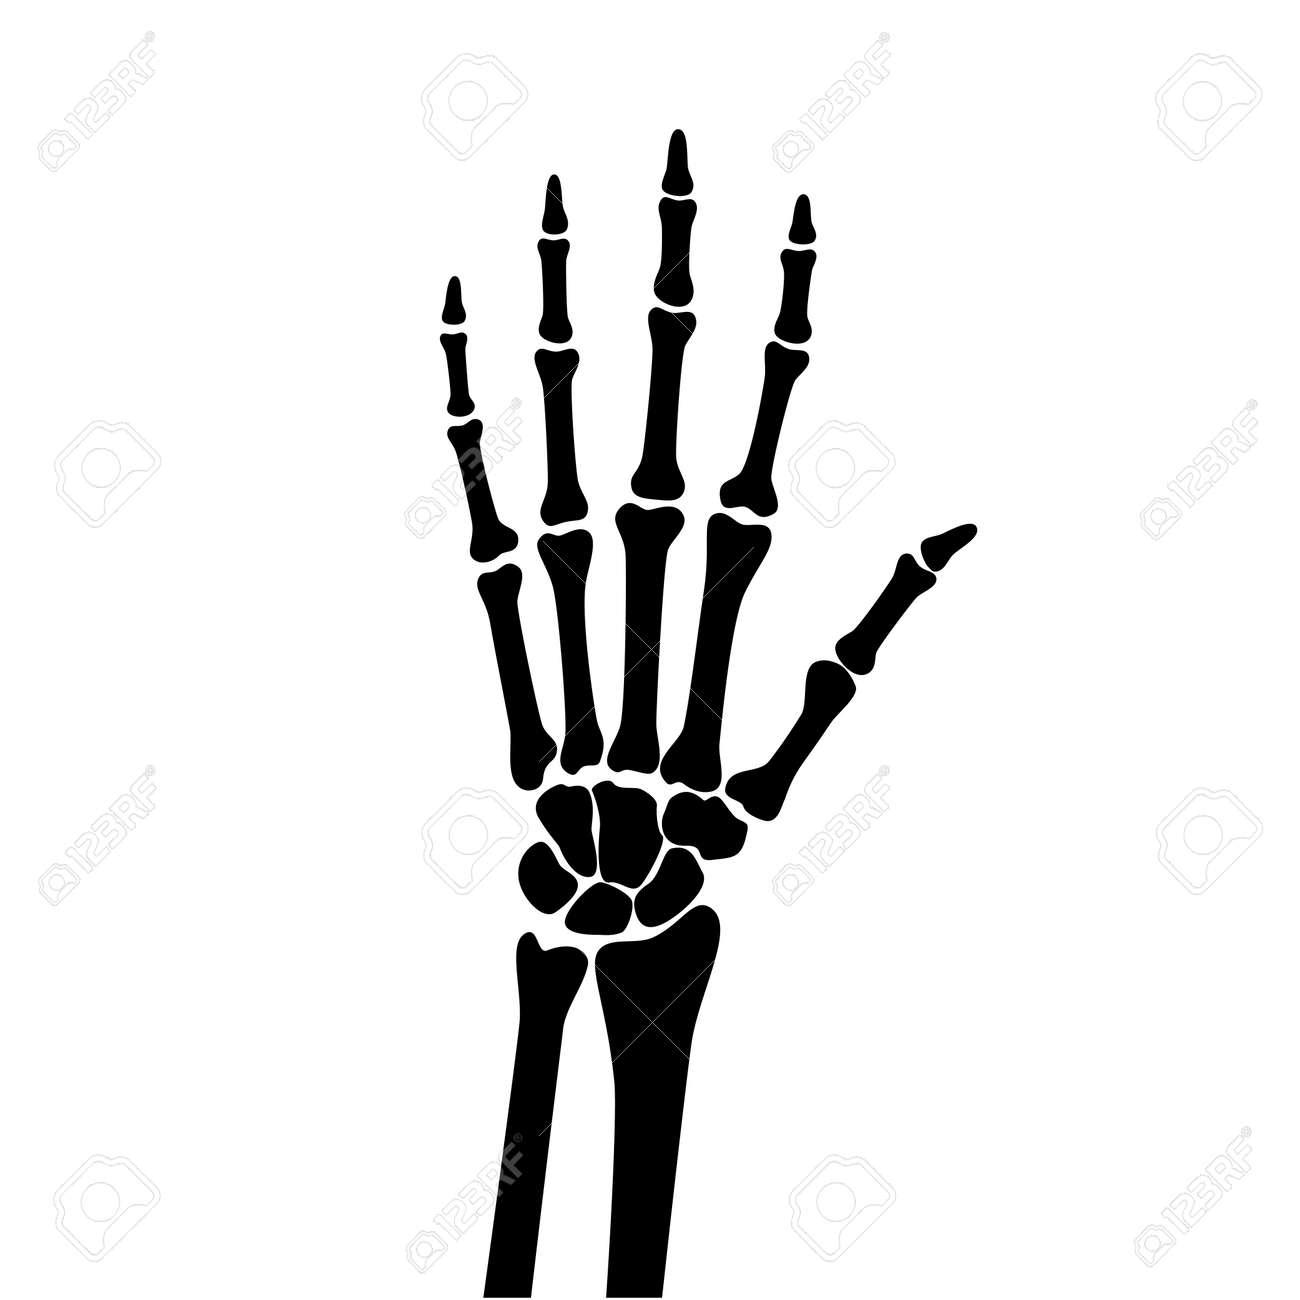 Arthritis x ray - 154619021